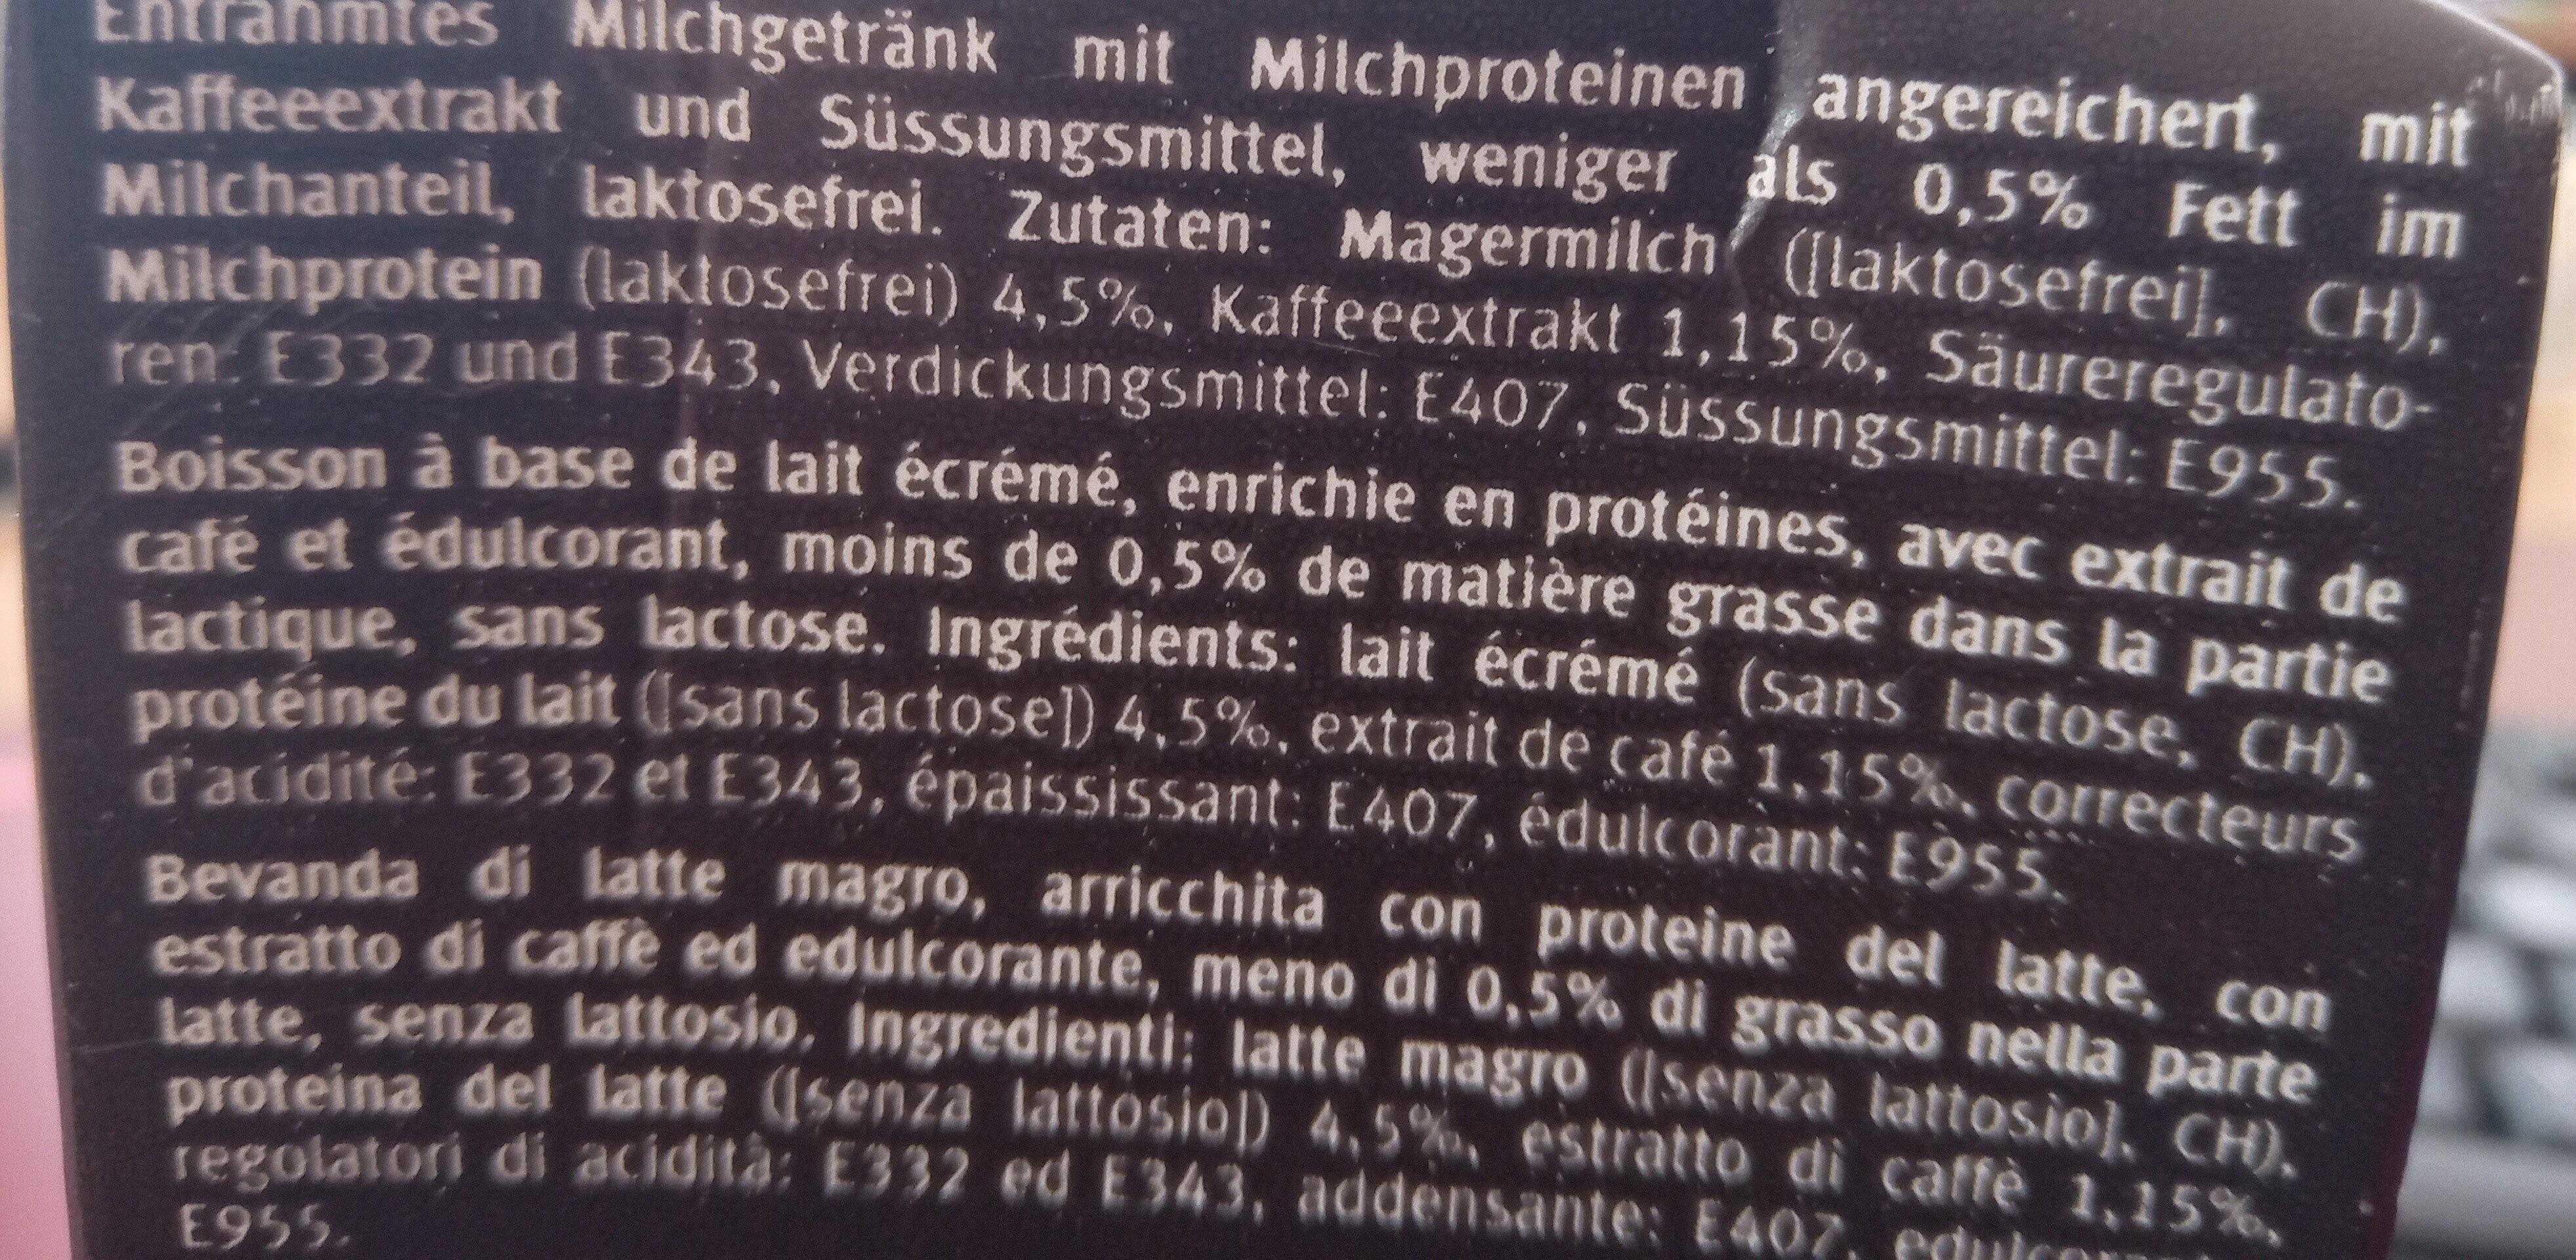 High Protein Drink Mokka - Ingredients